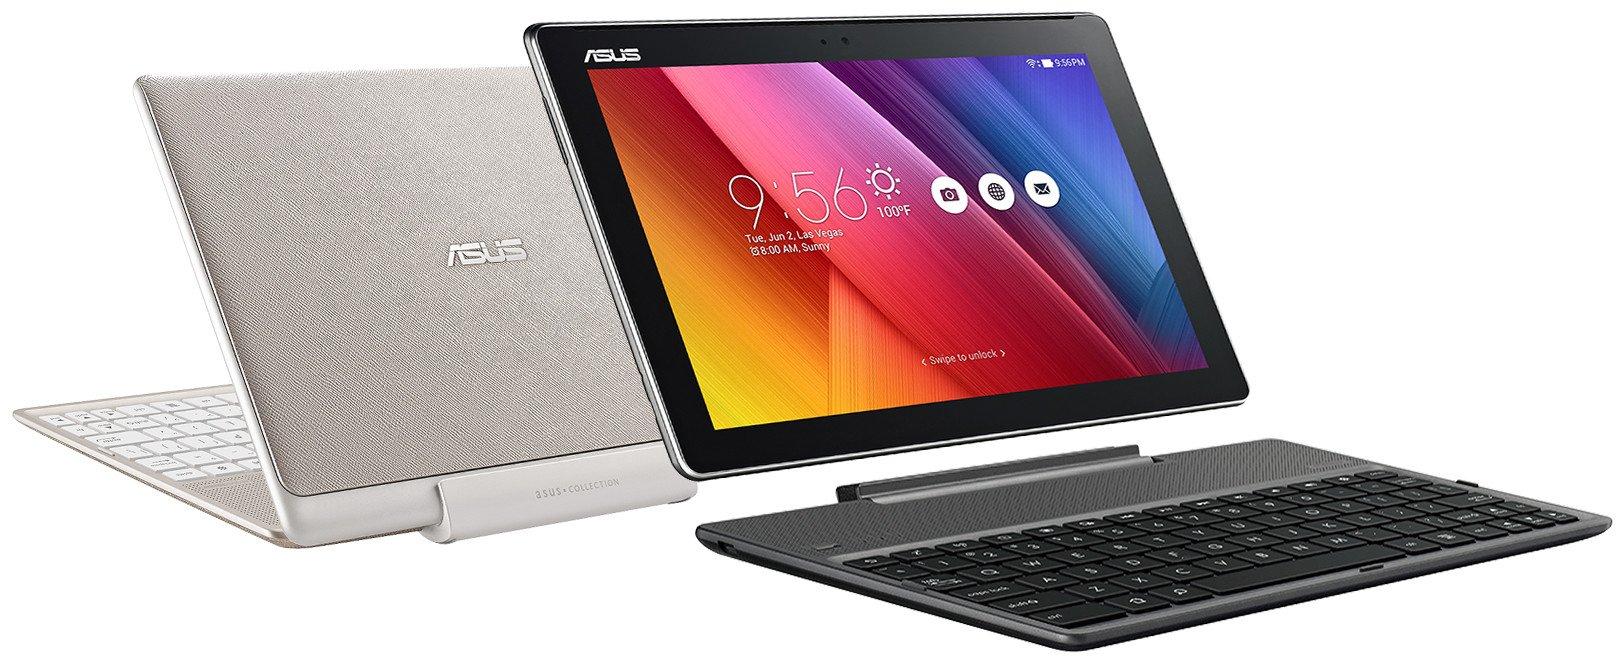 Das Asus Audio Dock macht das Tablet ZenPad 10 zum Subnotebook (Bild: Asus)